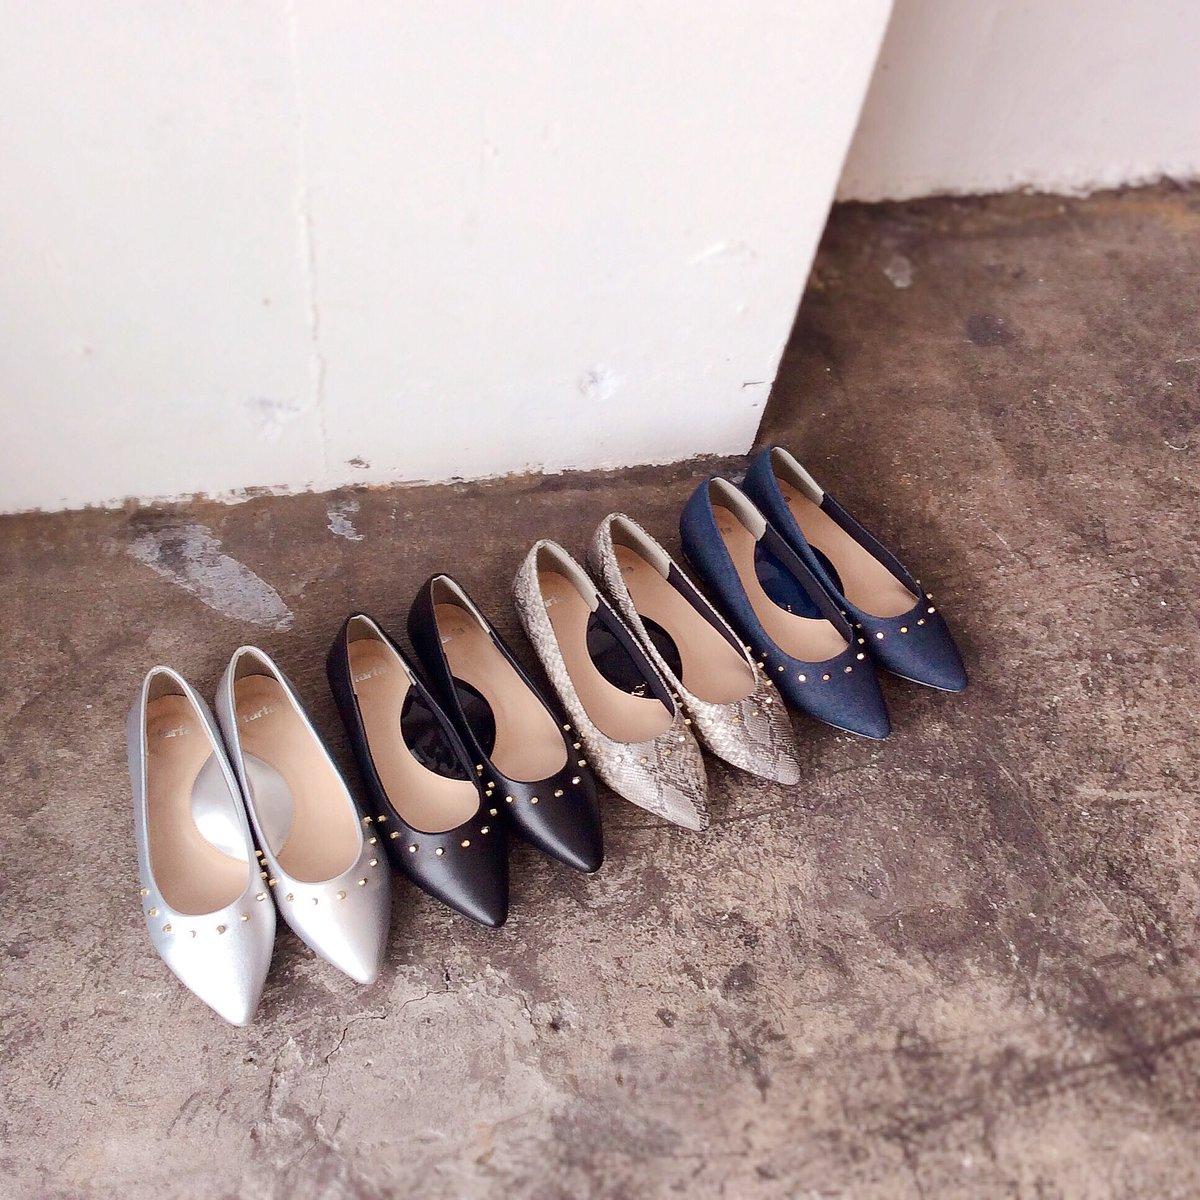 lafarfa_shoestw's photo on #靴の記念日